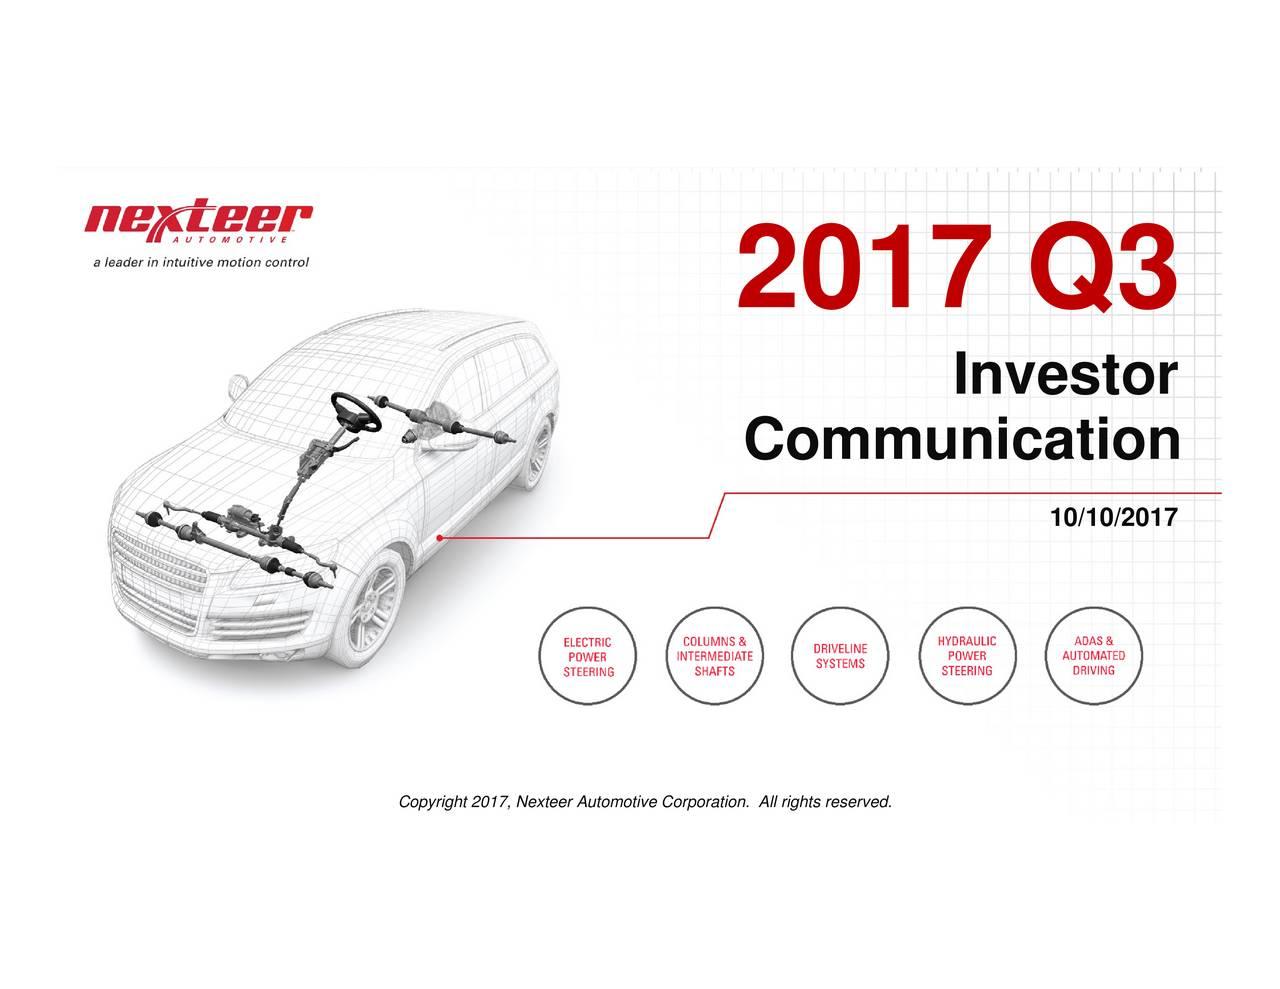 Investor lghtsreseved.. Communication 2017 Q3 Copyrght2017NeexeerAutomotveCooporaton.All 1